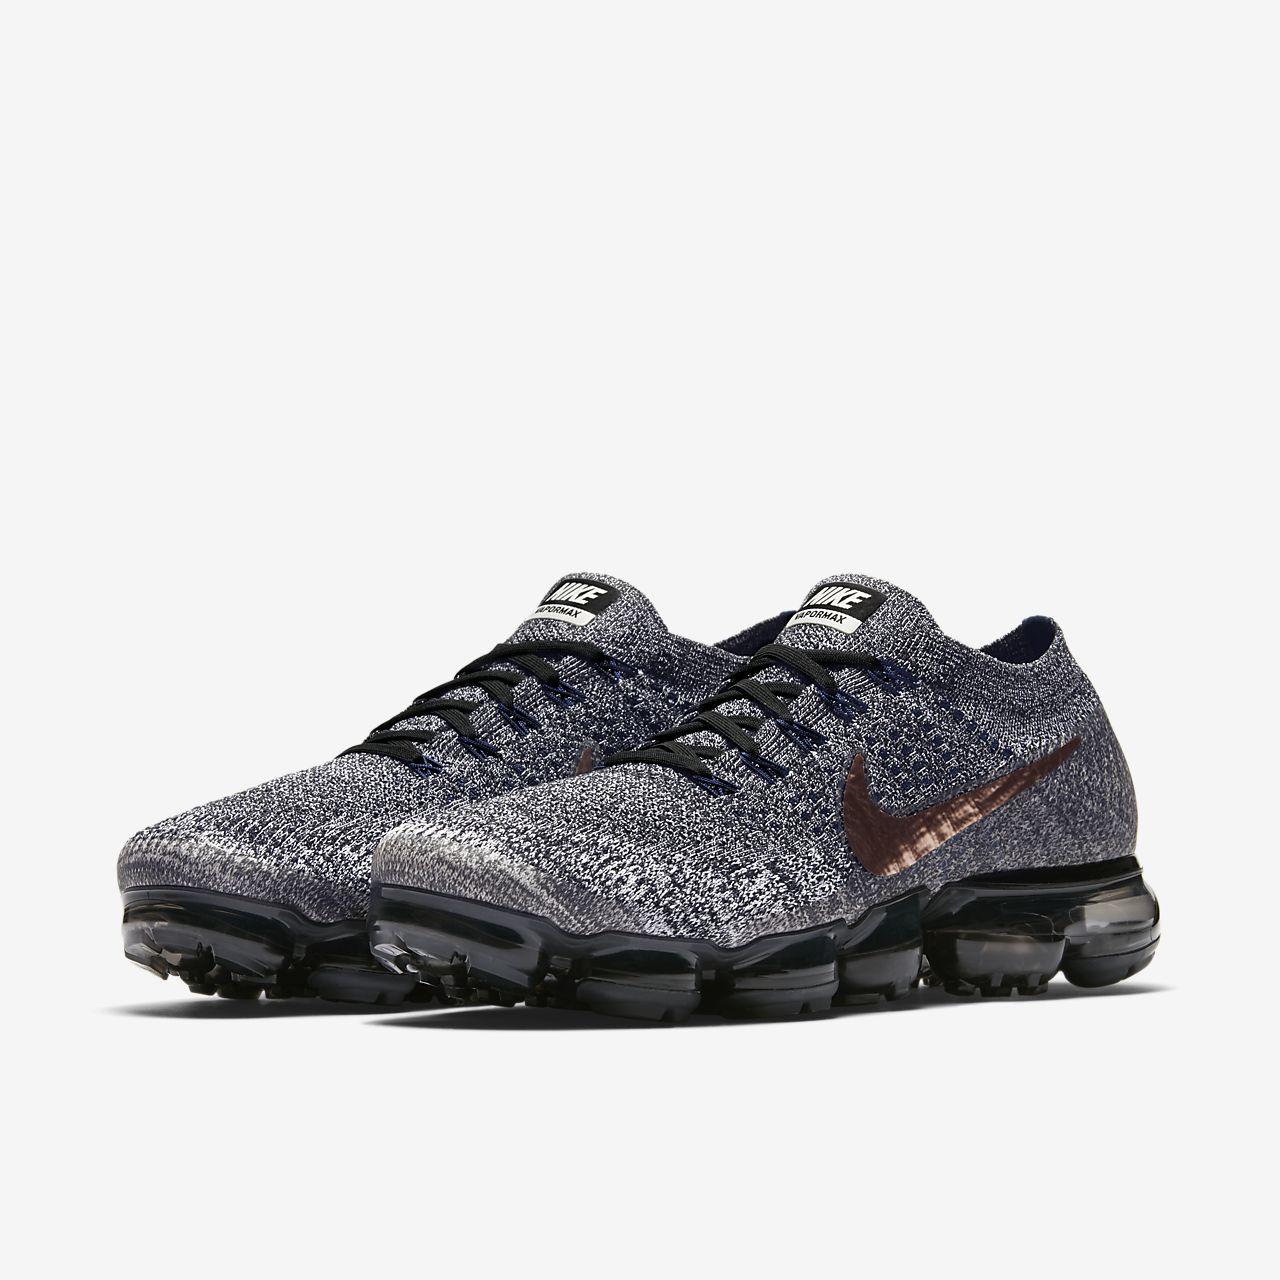 ... Nike Air VaporMax Flyknit Explorer Men's Running Shoe